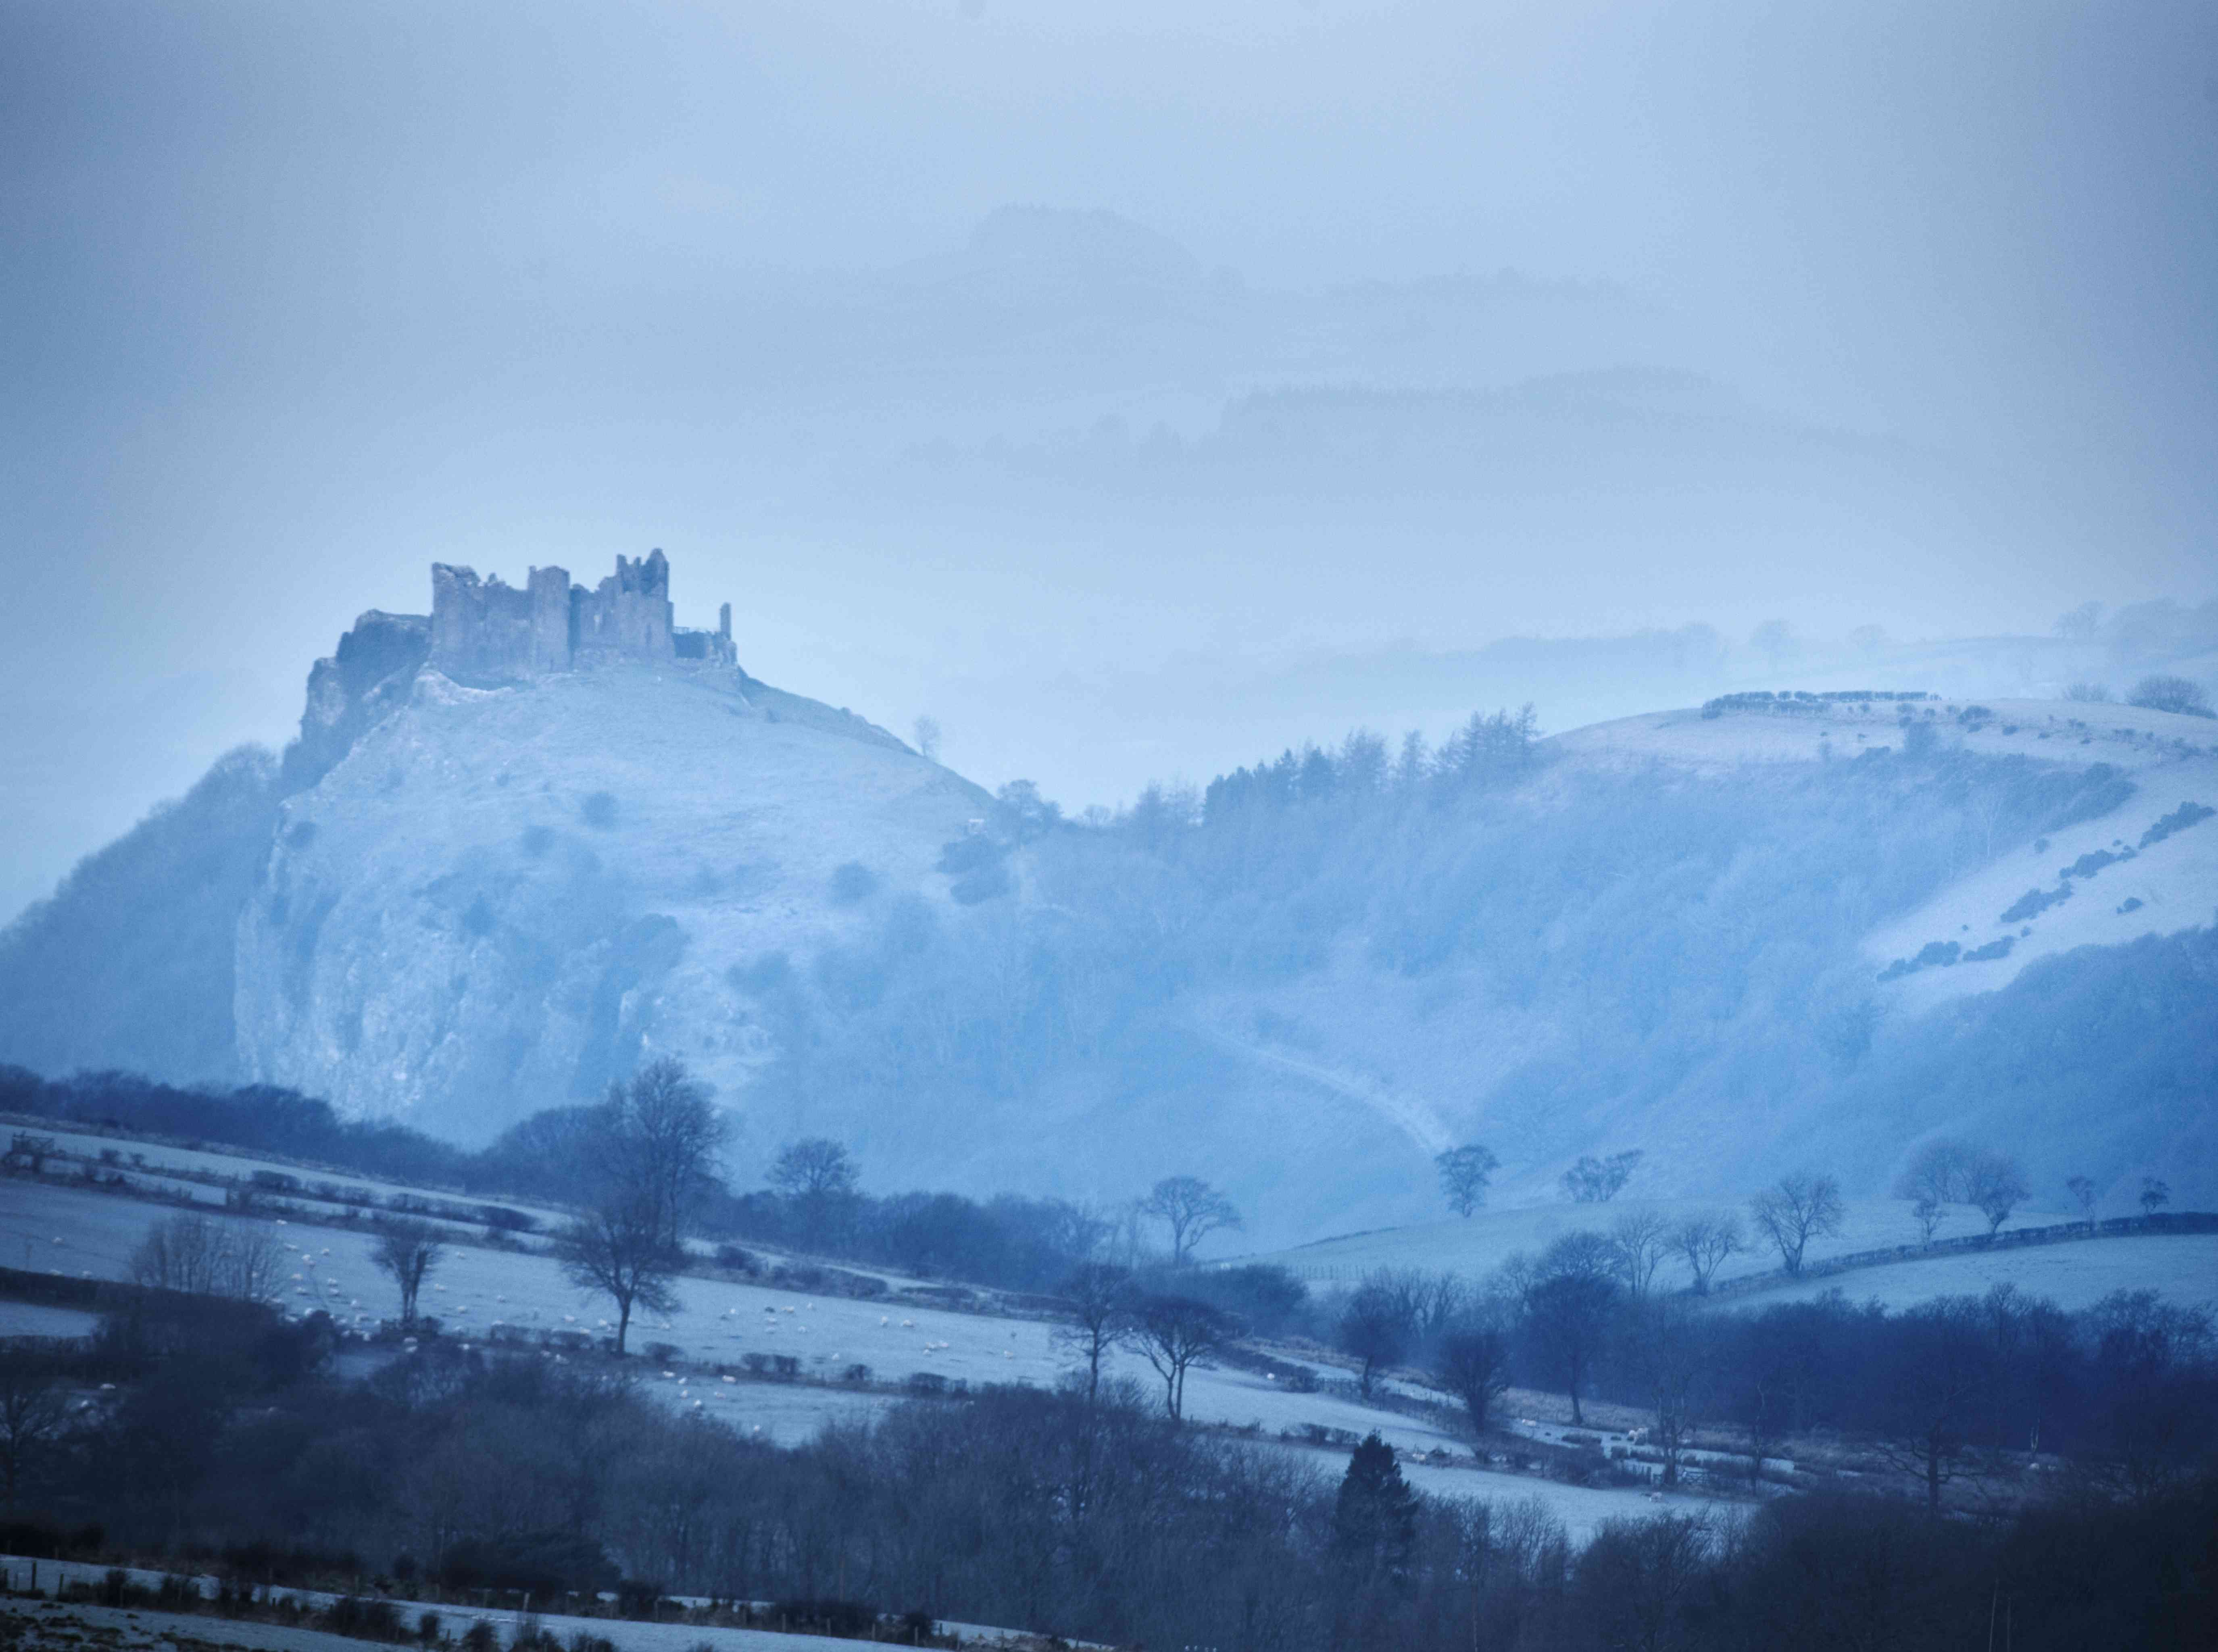 Carreg Cennan Castle, near Llandeilo, Wales